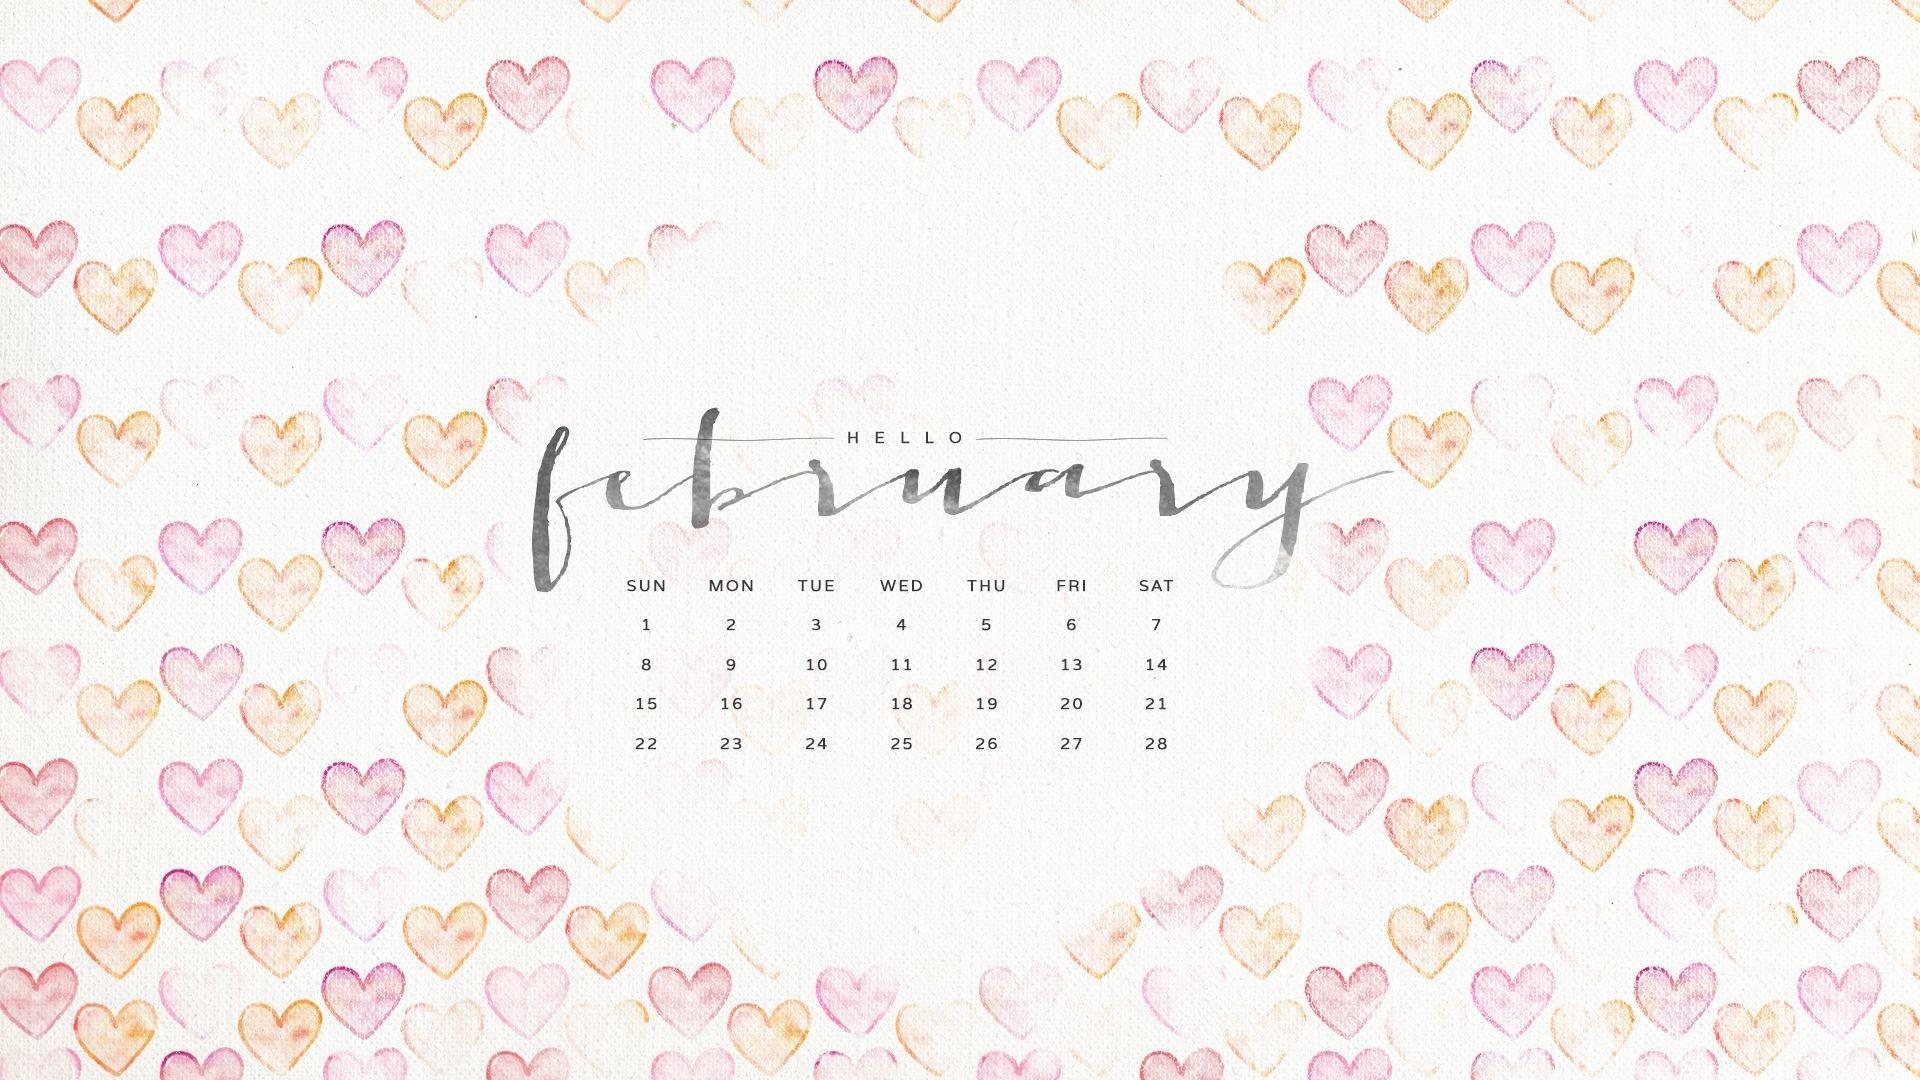 Desktop Wallpaper Calendar 2018 (59+ images)